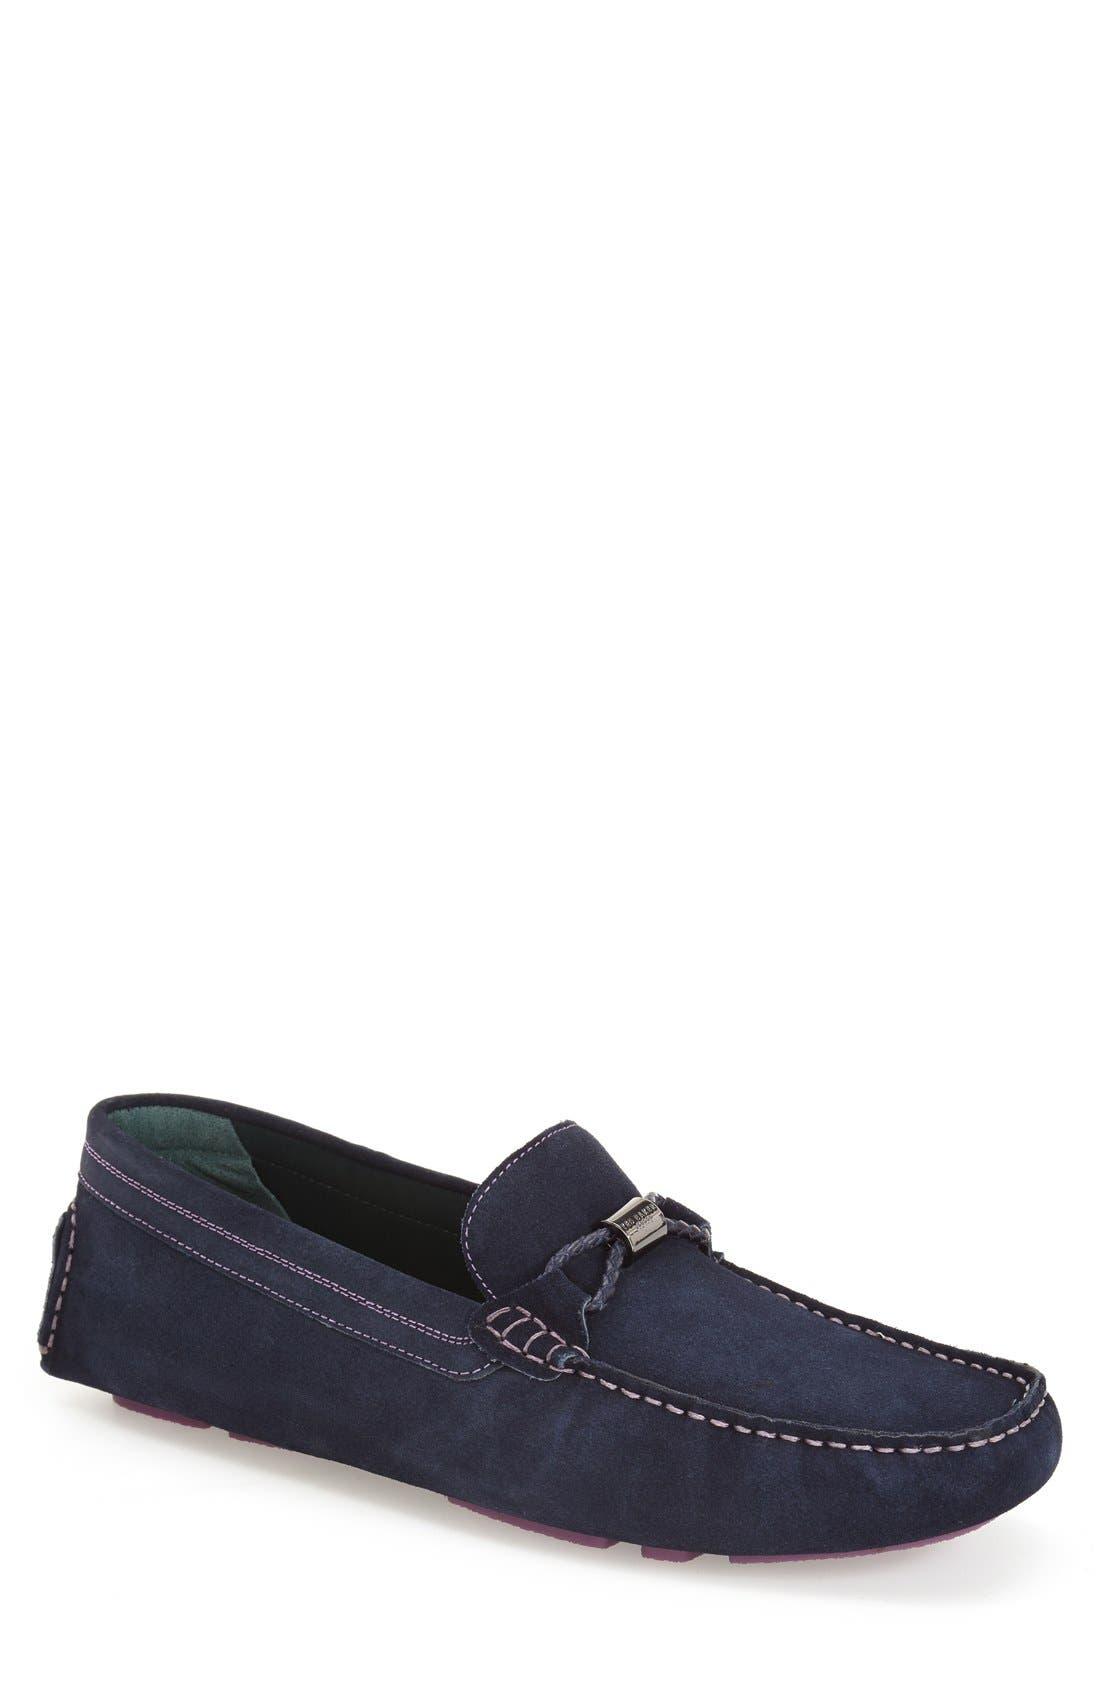 Alternate Image 1 Selected - Ted Baker London 'Carlsun' Driving Shoe (Men)